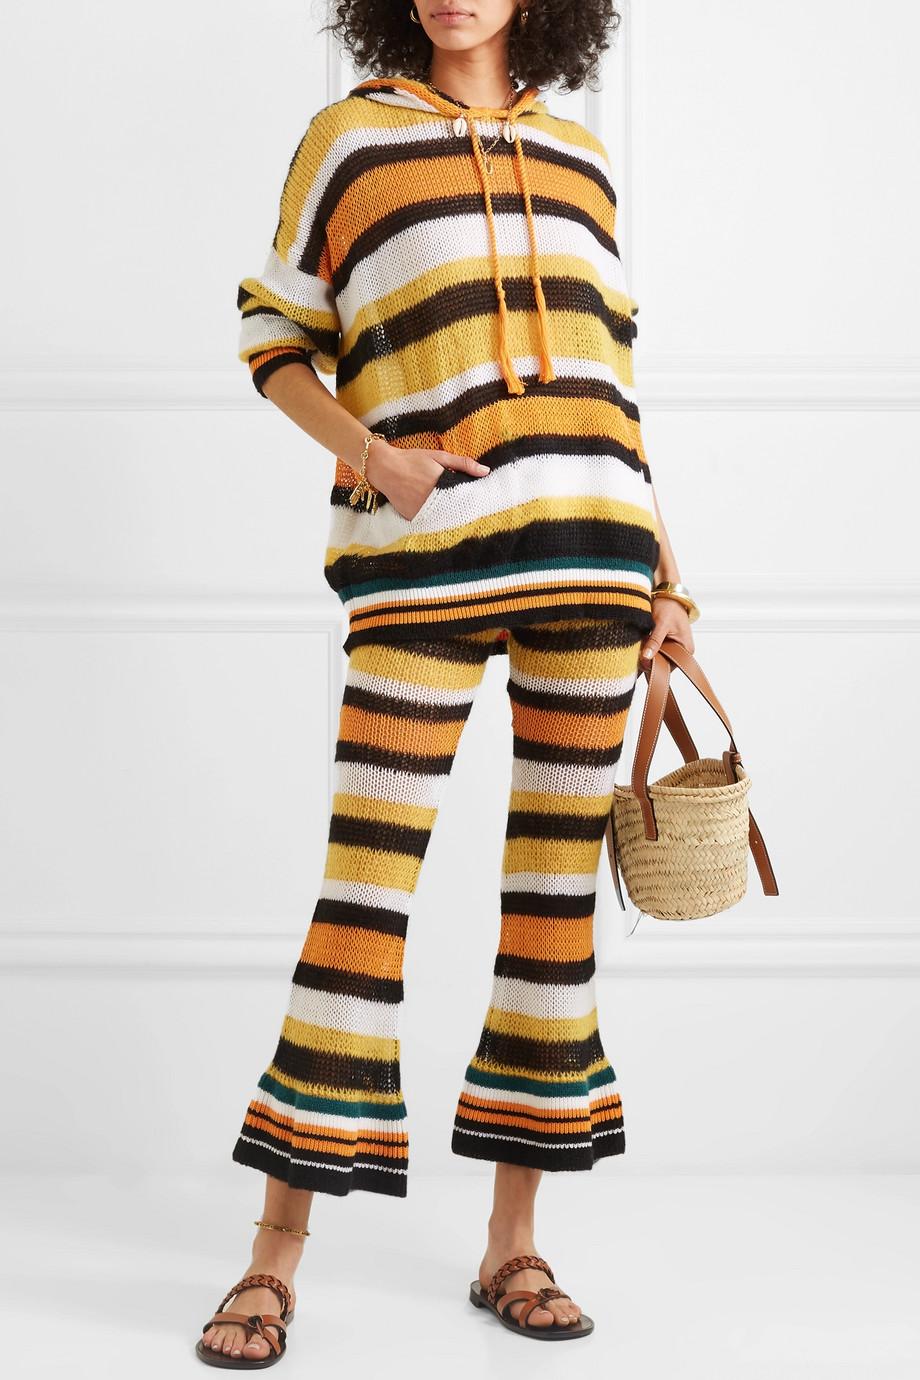 Loewe + Paula's Ibiza hooded striped knitted sweater